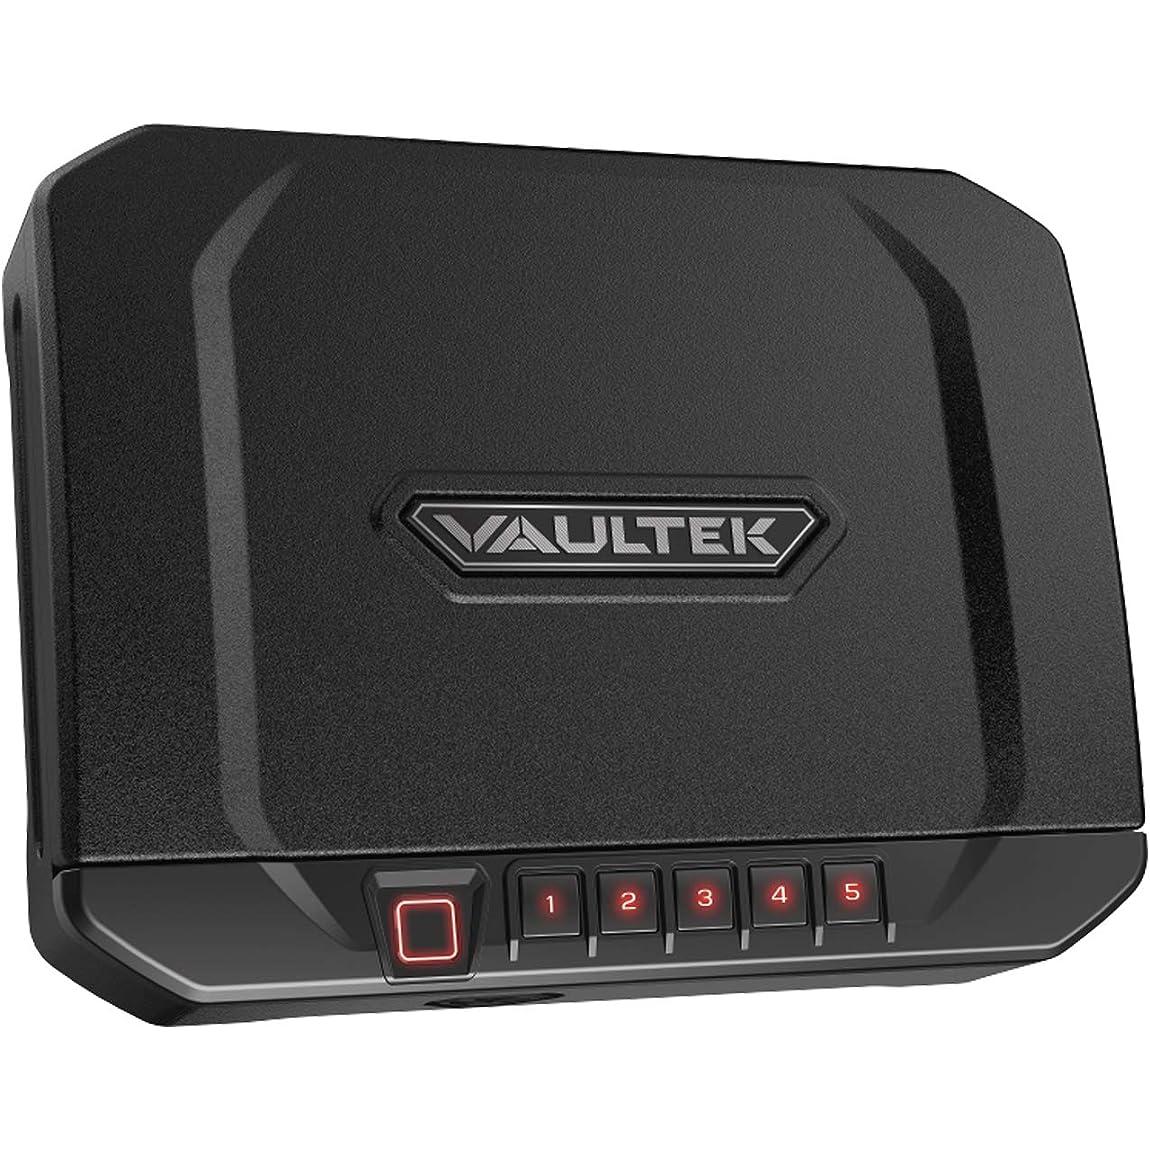 Vaultek Vt20i Biometric Bluetooth Smart Handgun Safe